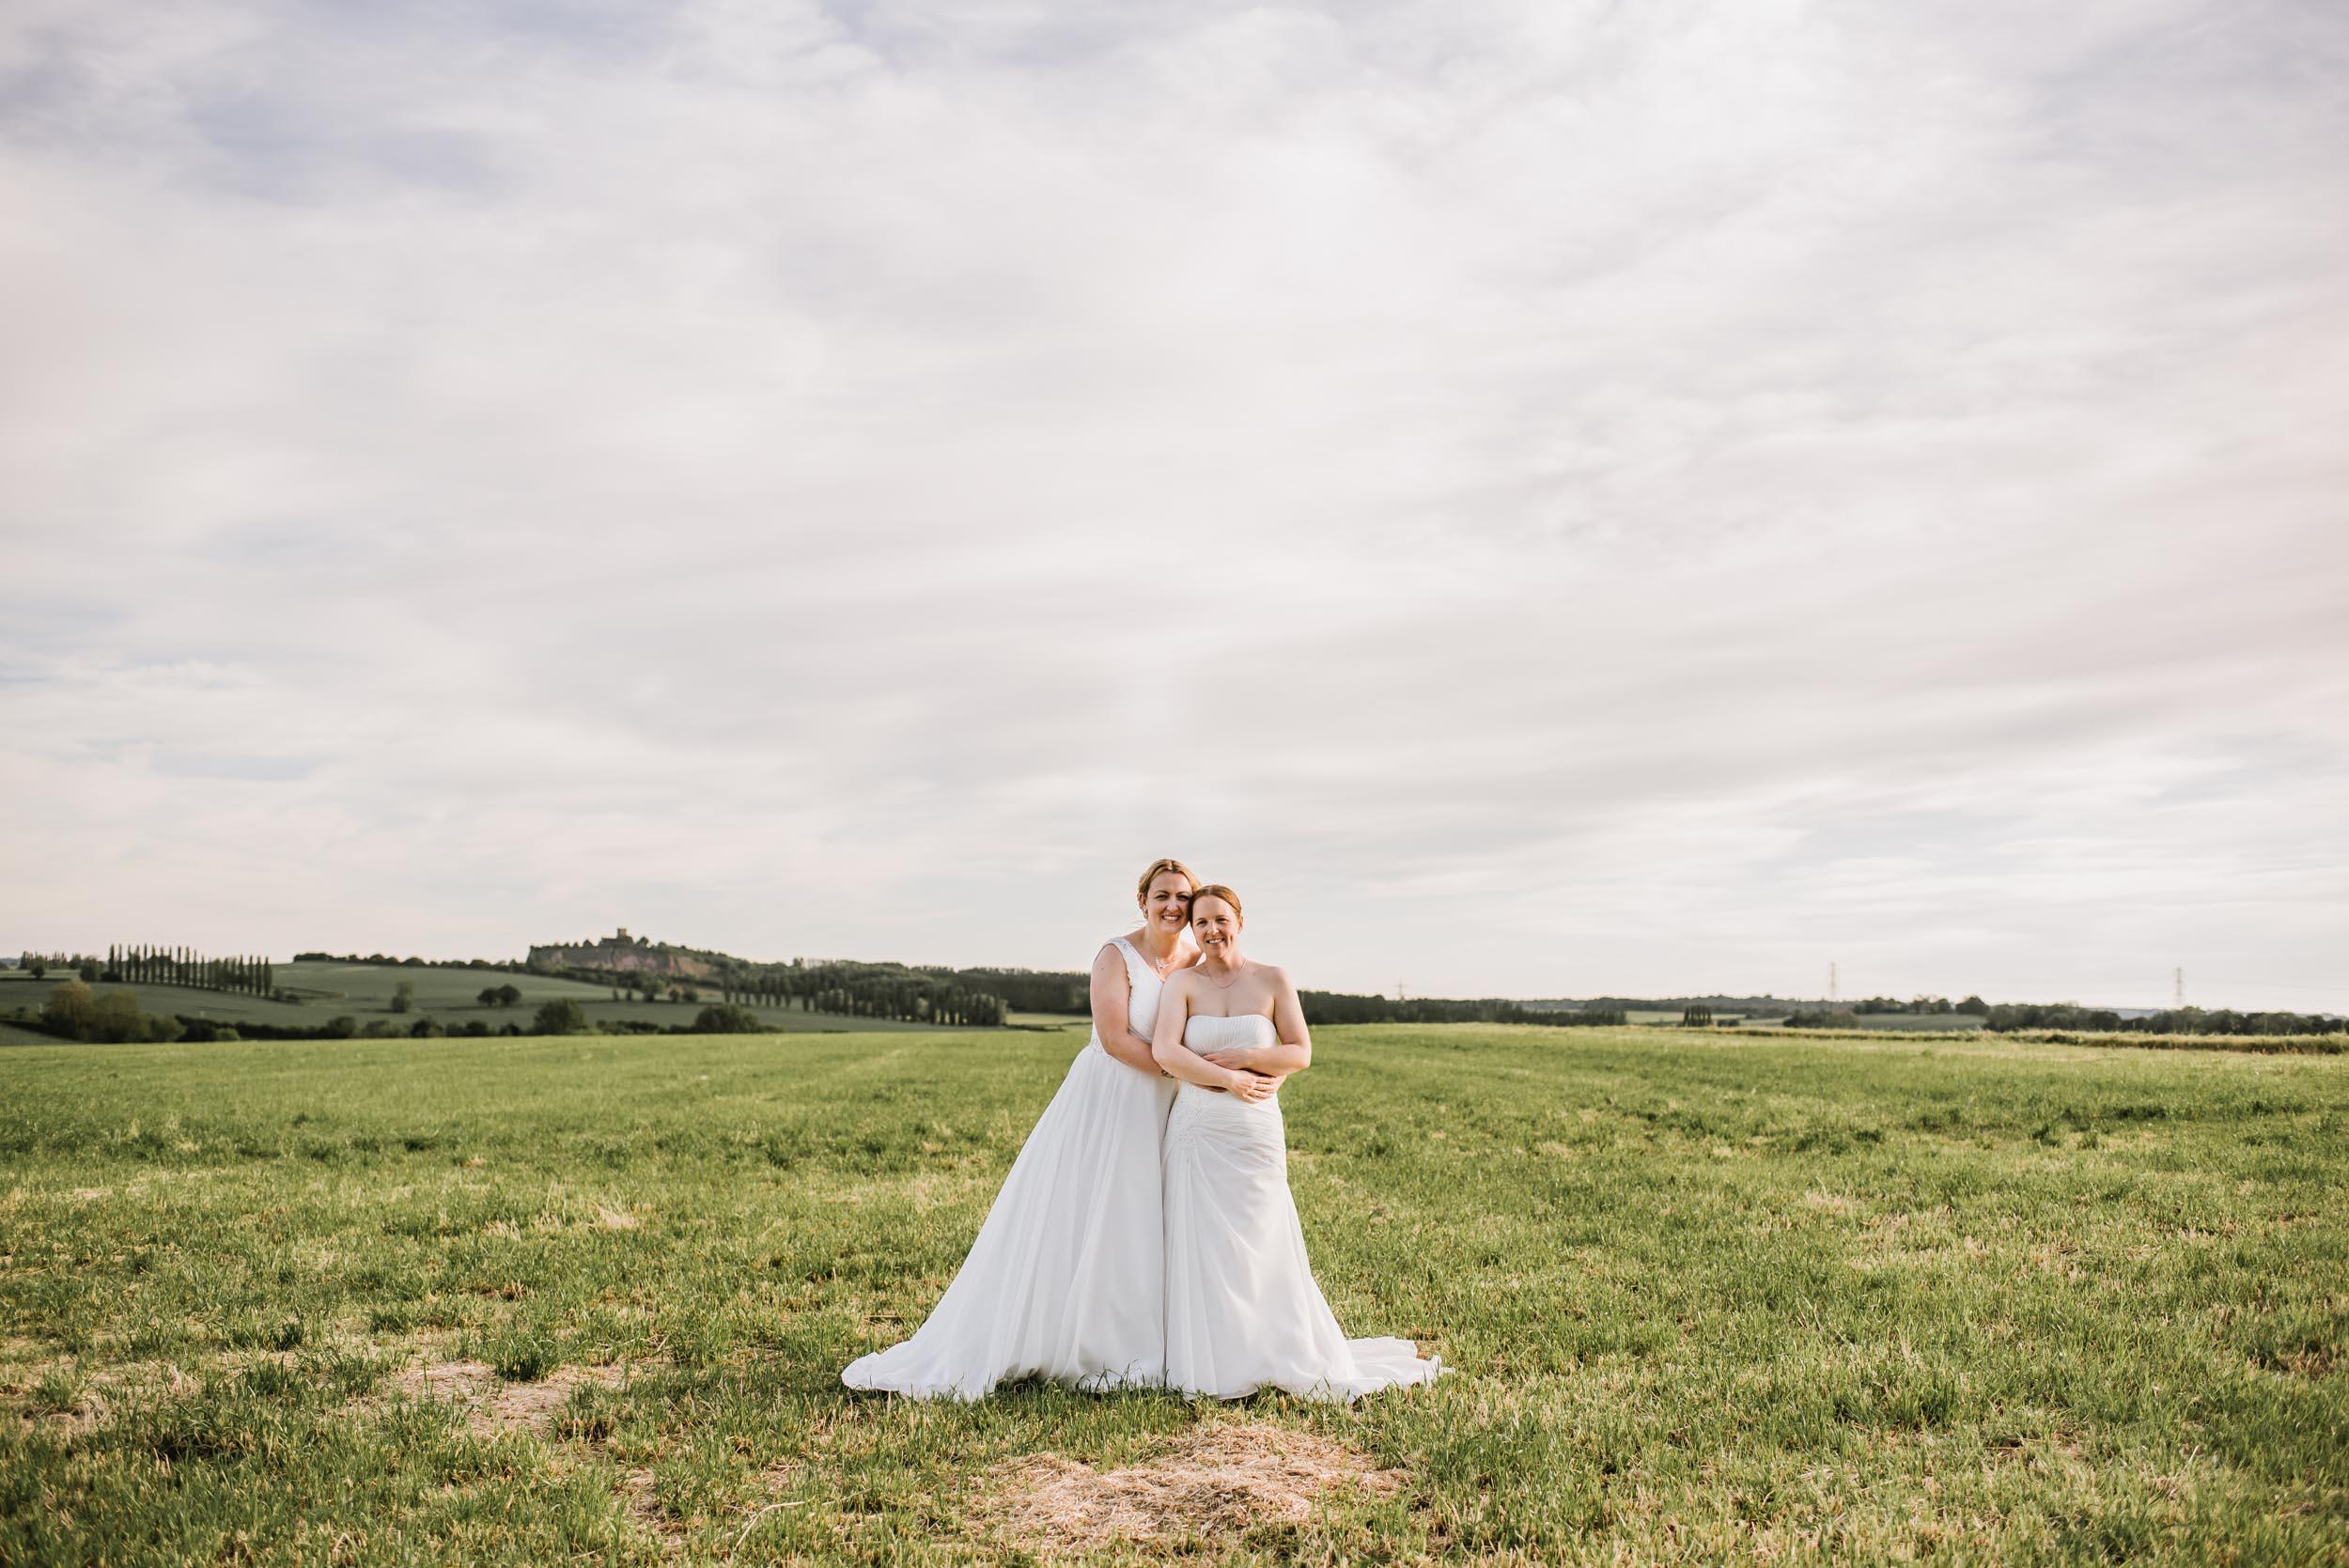 Donington-park-farm-wedding-photography-688.jpg